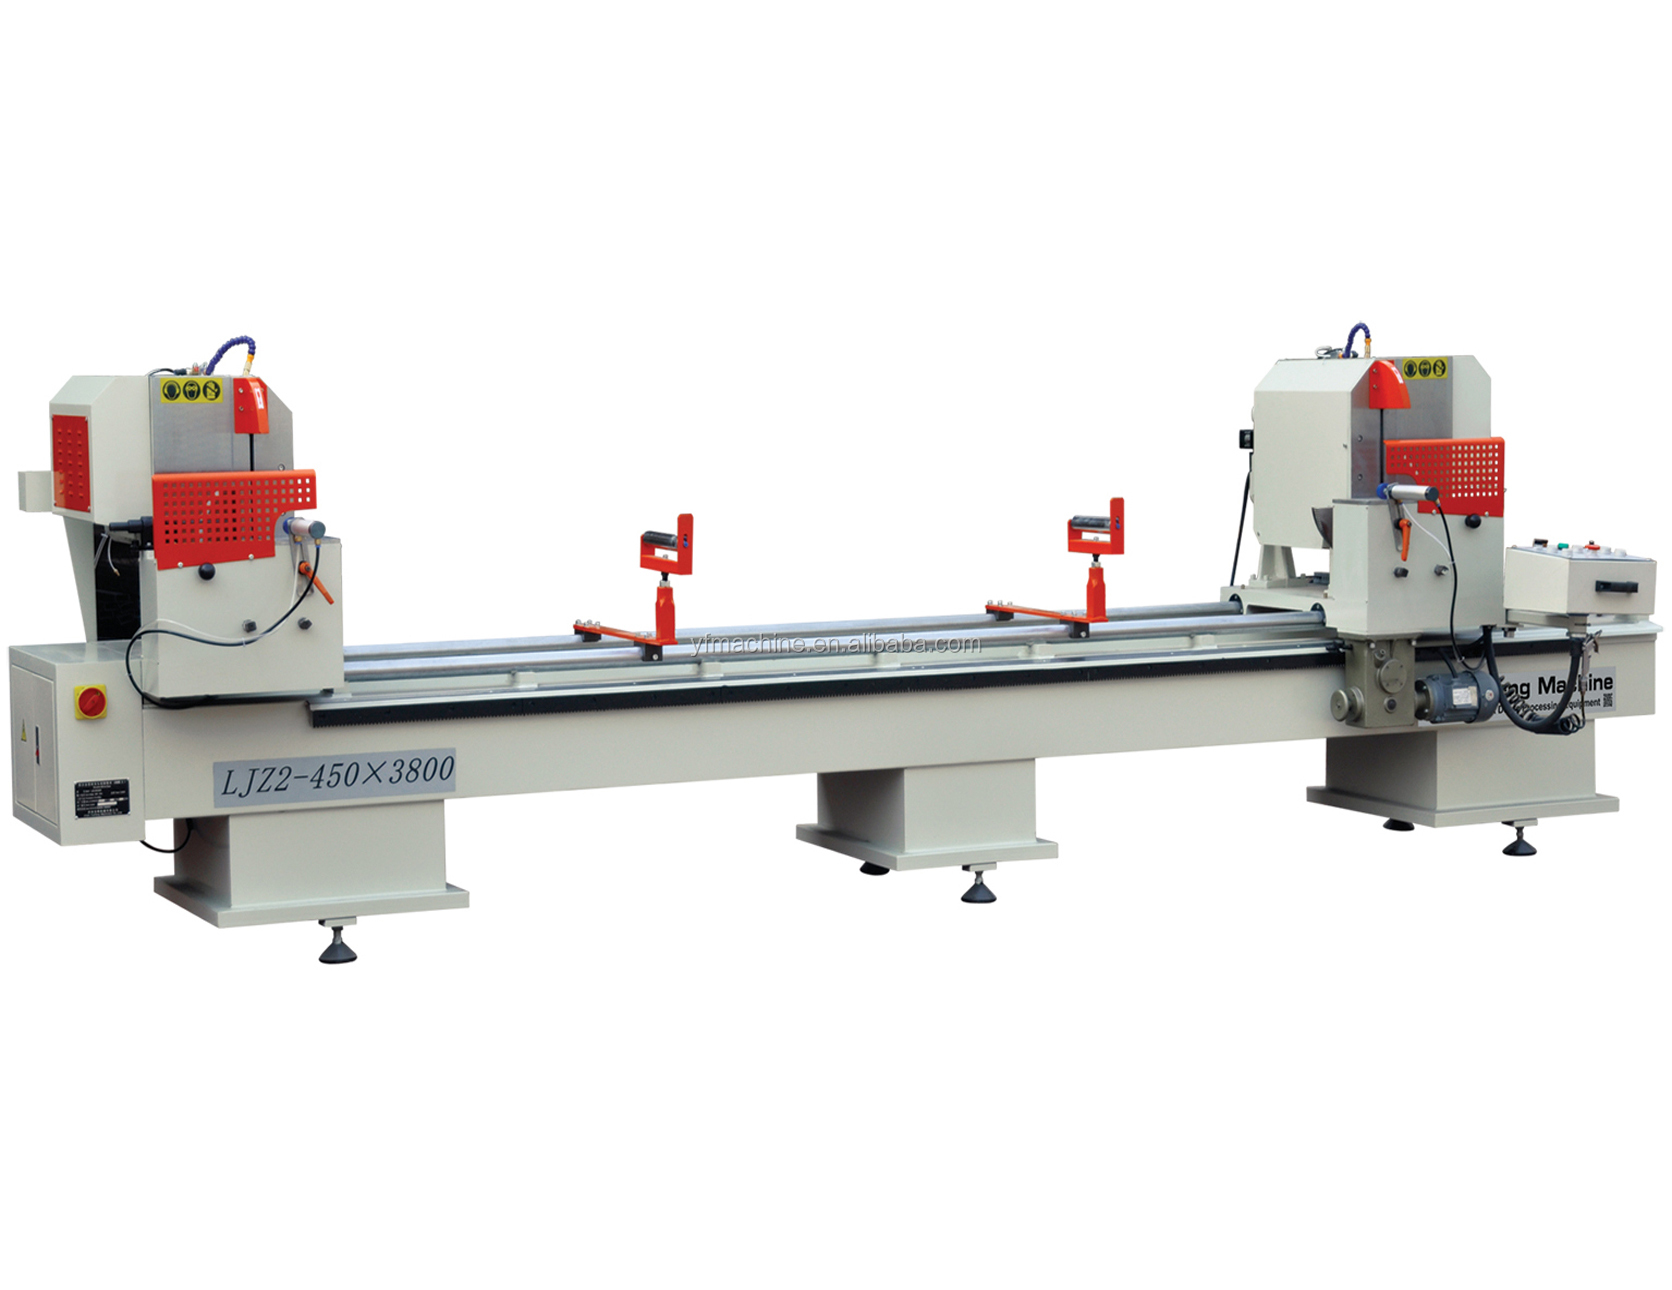 Aluminium Raam Fabricage Machine Dubbele Kop Snijden Zaag